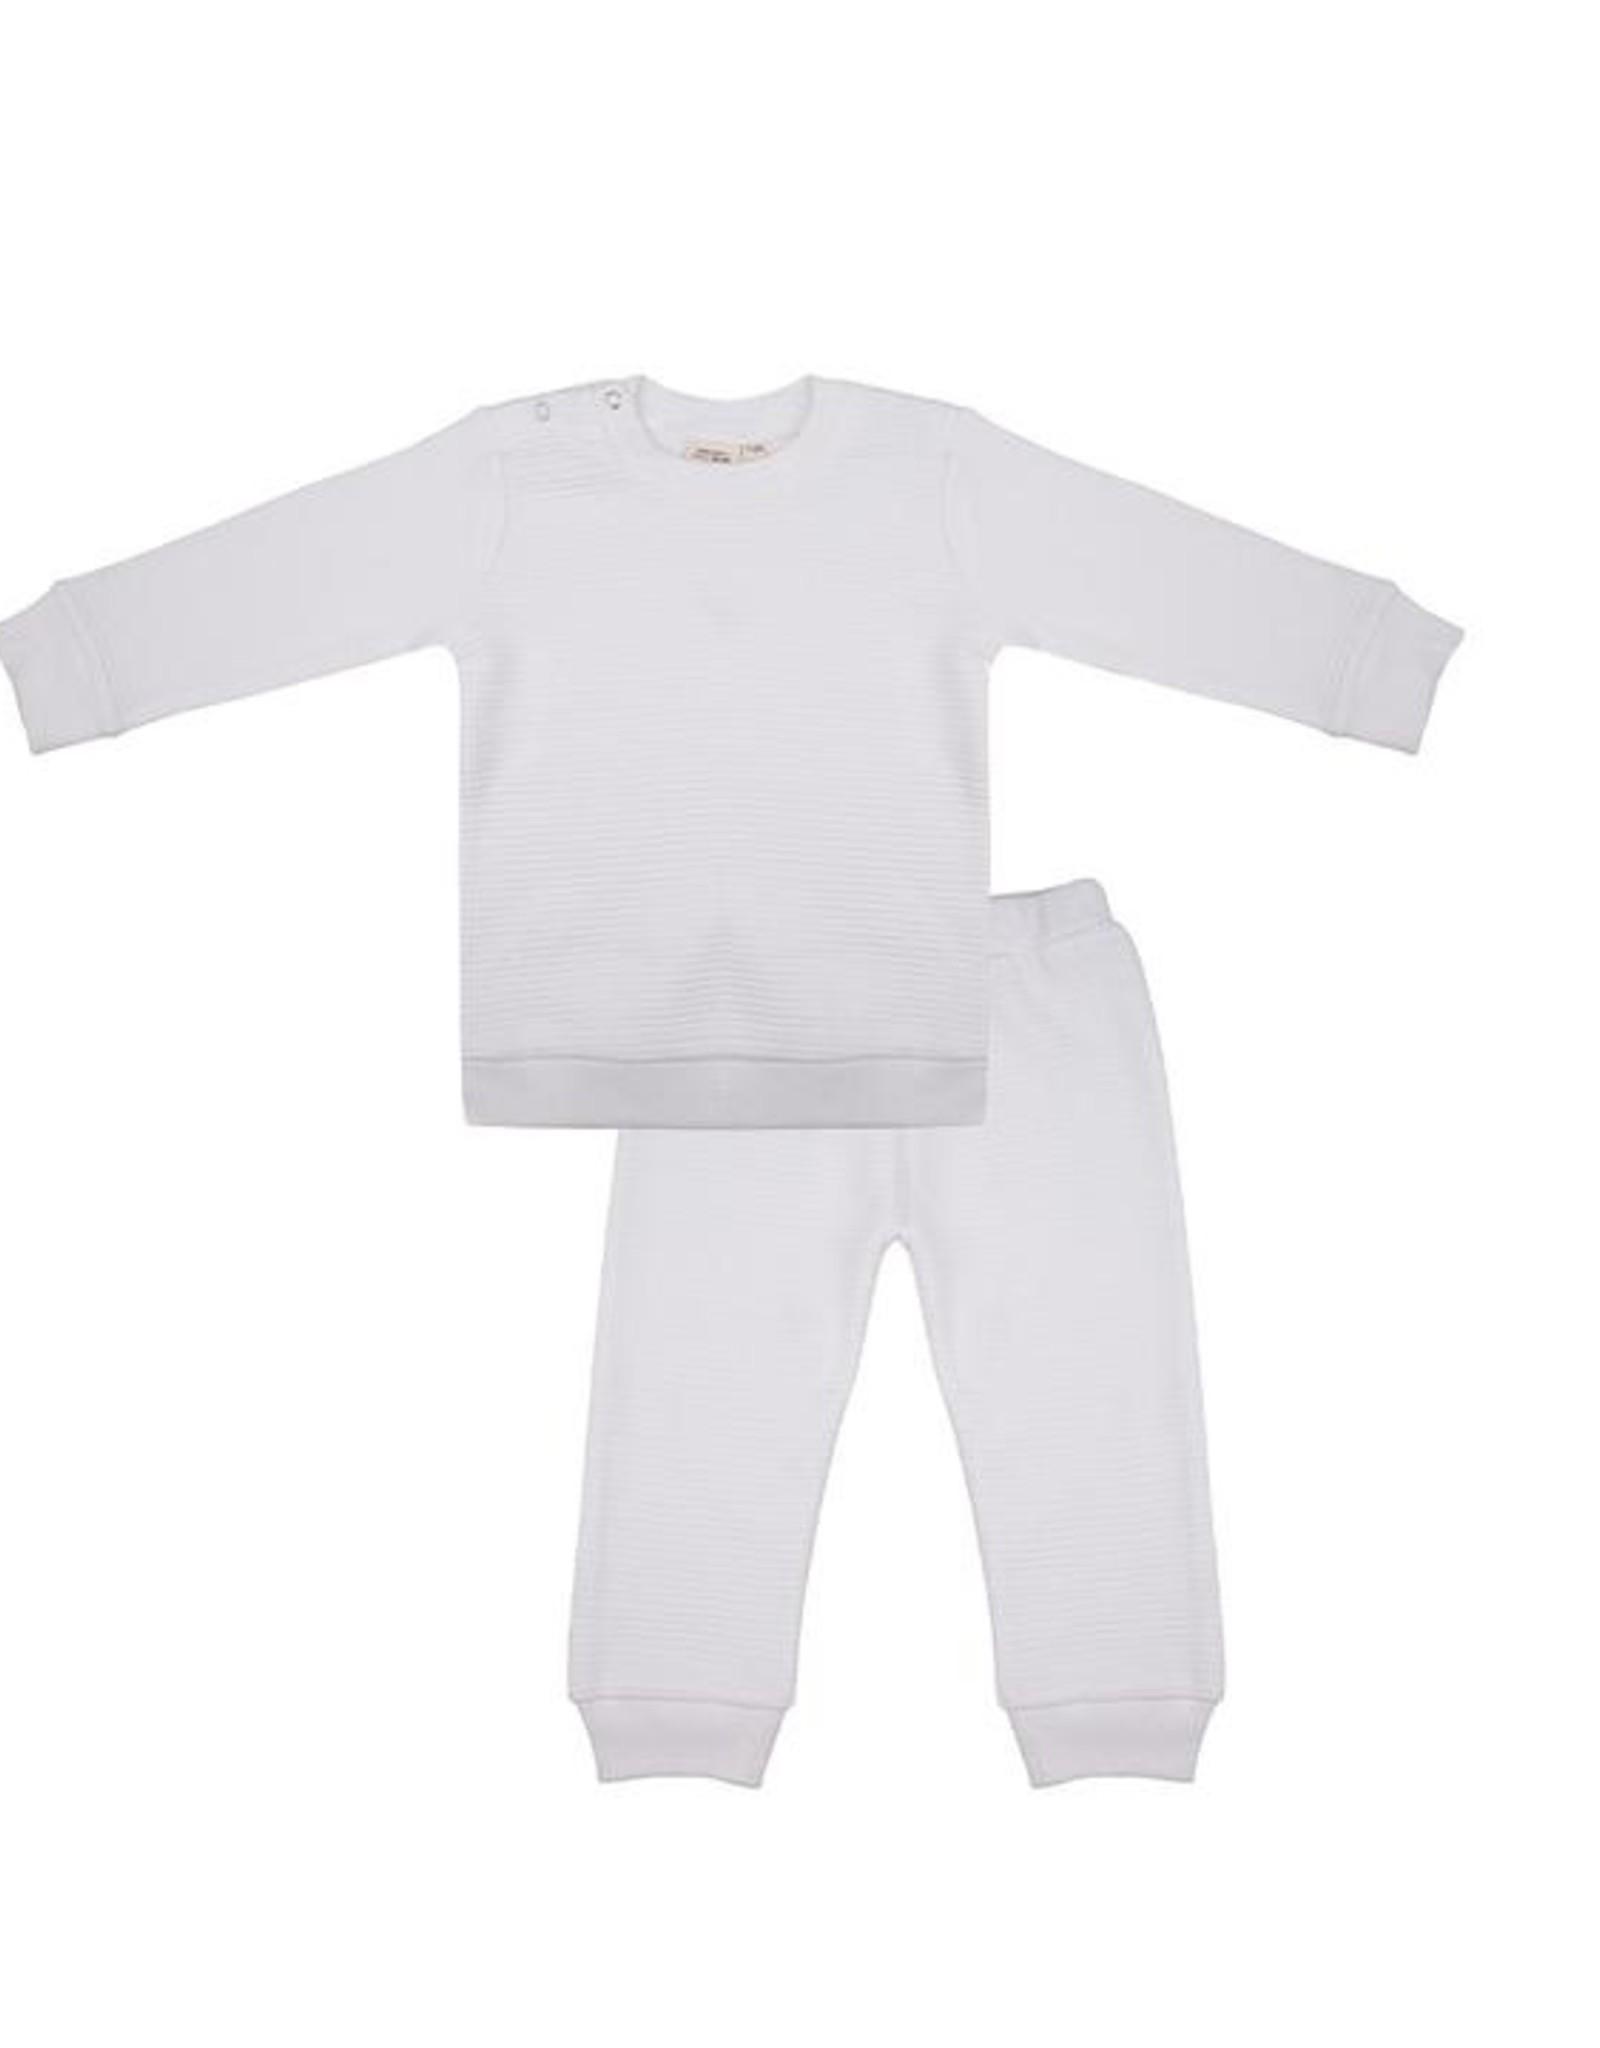 Little Indians Pyjama - Cloud Dancer 0 -3 m